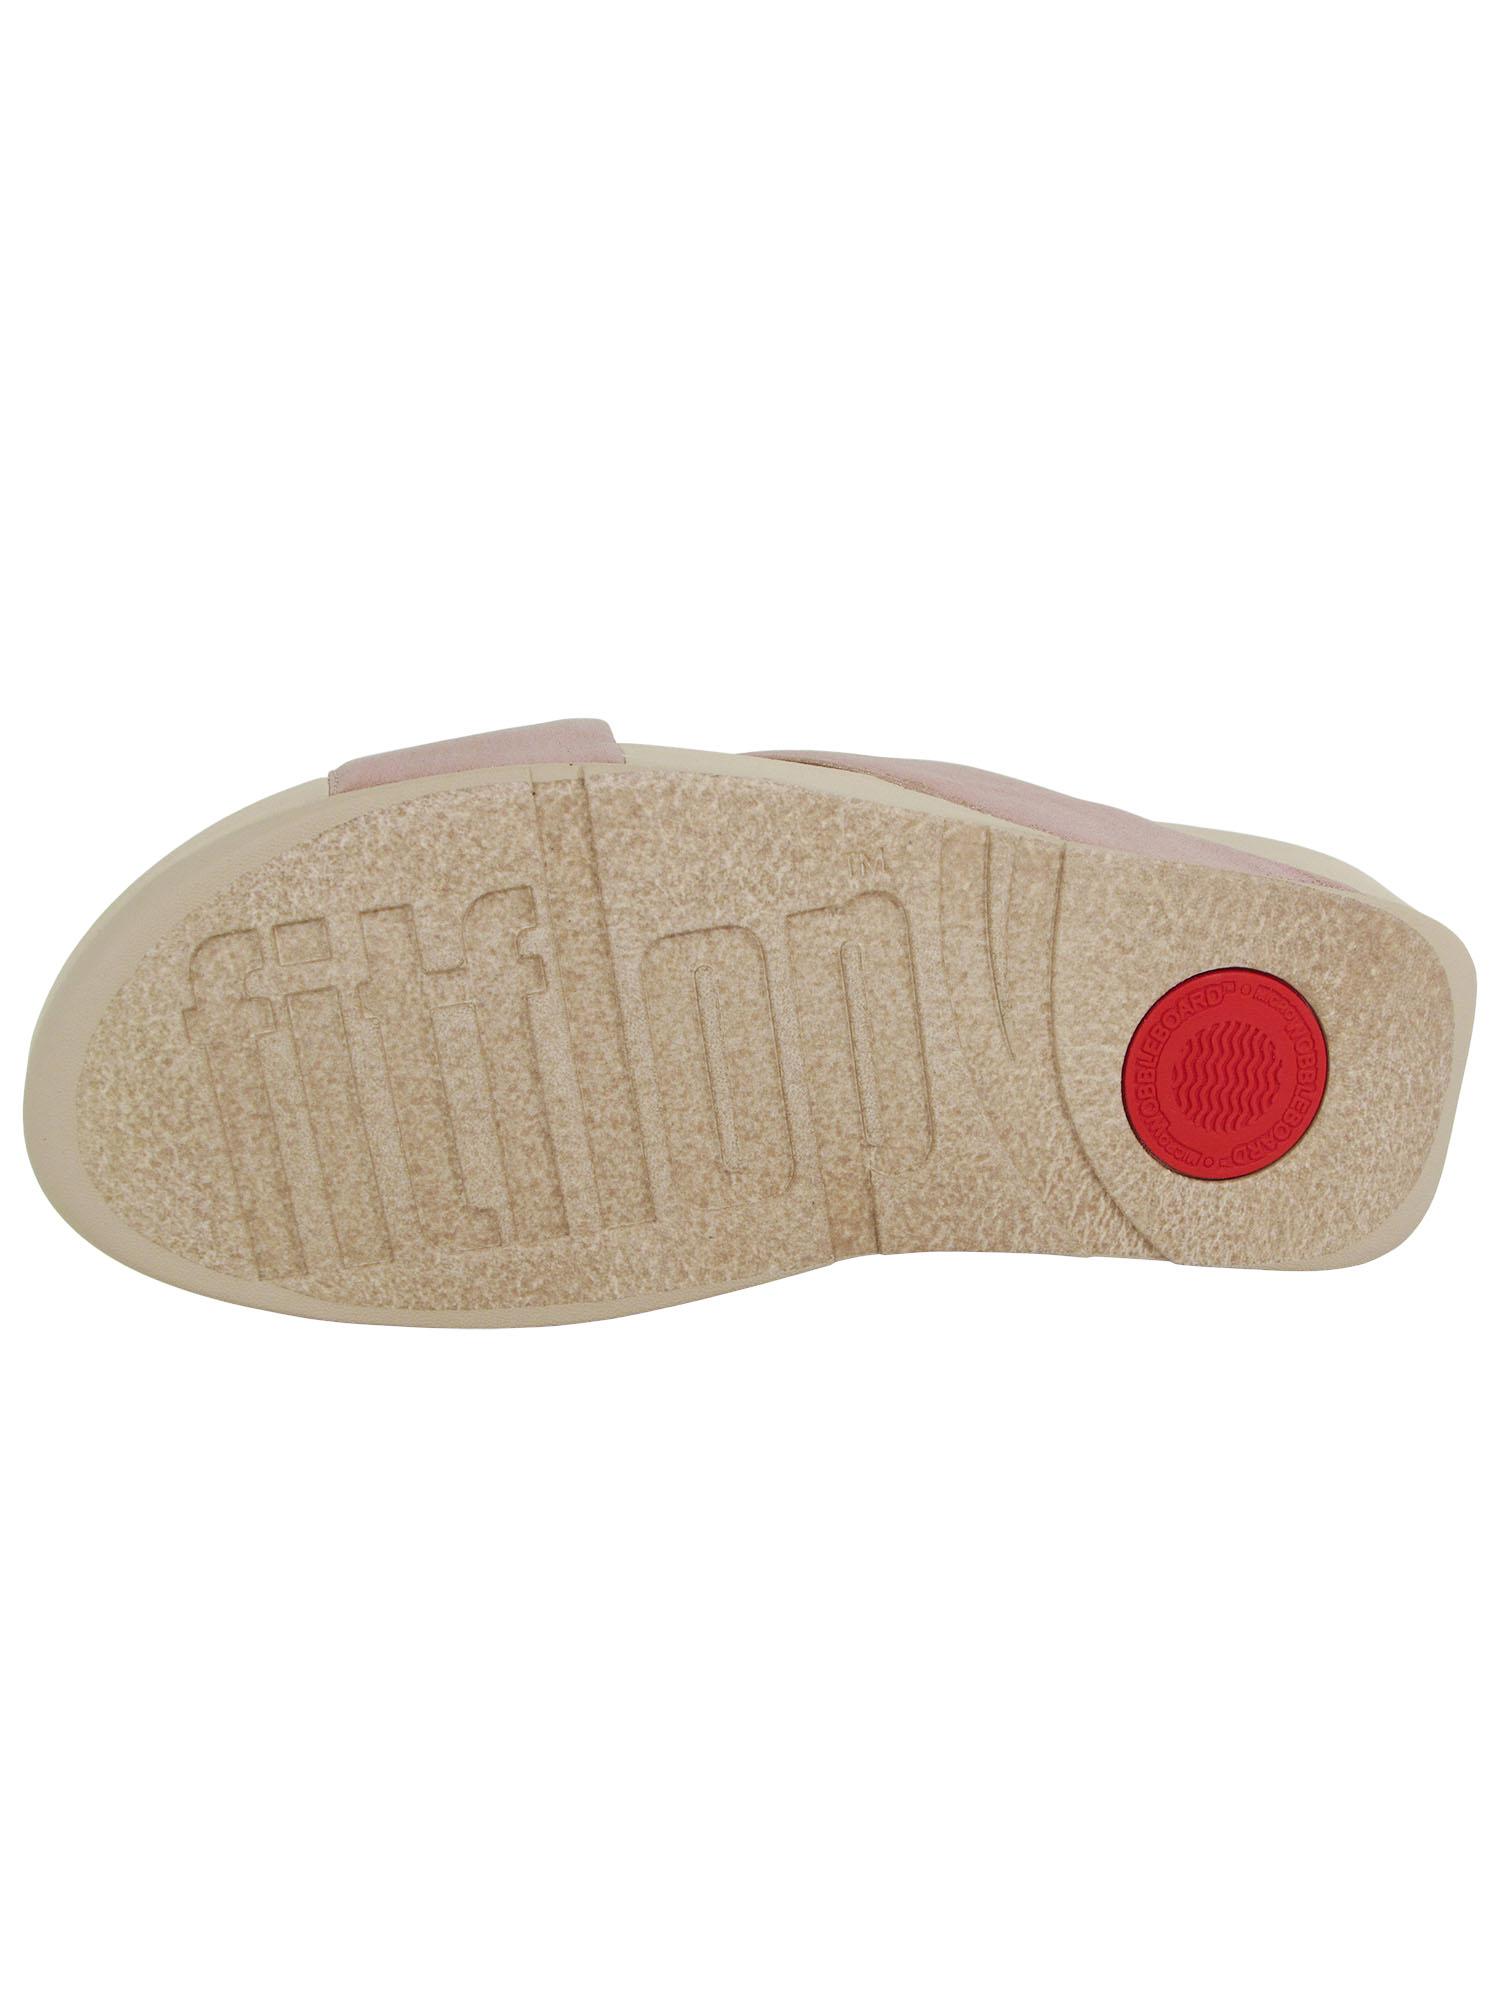 Fitflop-Womens-Lulu-Cross-Glitz-Slide-Sandal-Shoes thumbnail 15